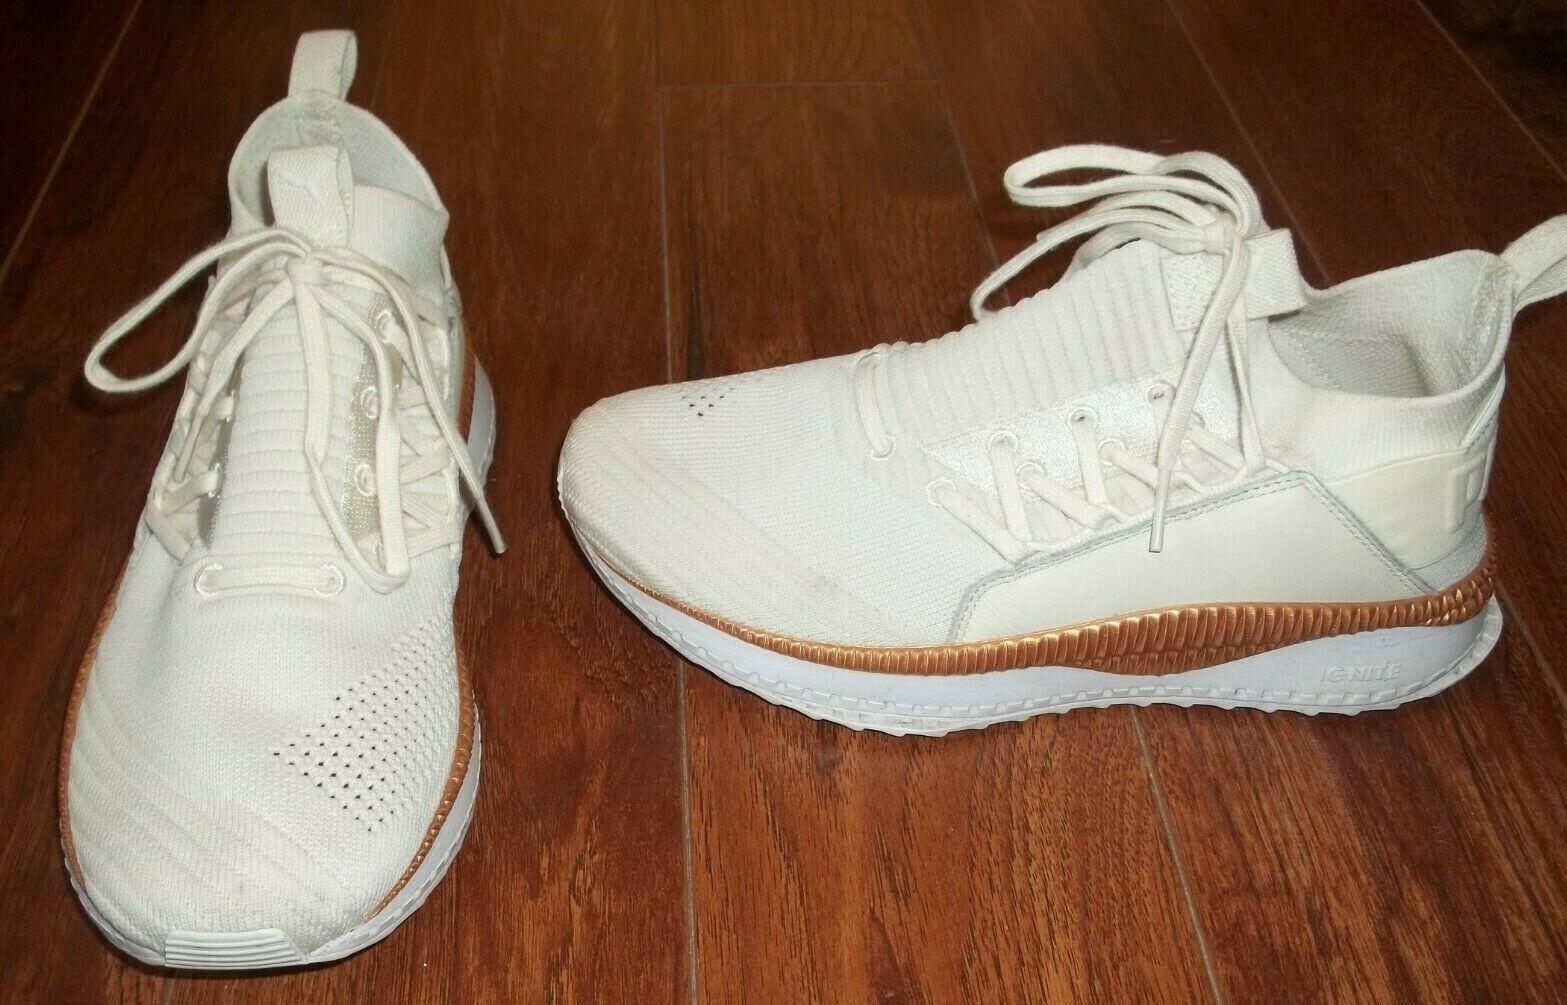 Puma evoknit Ignite Crème Or Blanc Sneaker Chaussures Taille 8.5 36703812 EUC!